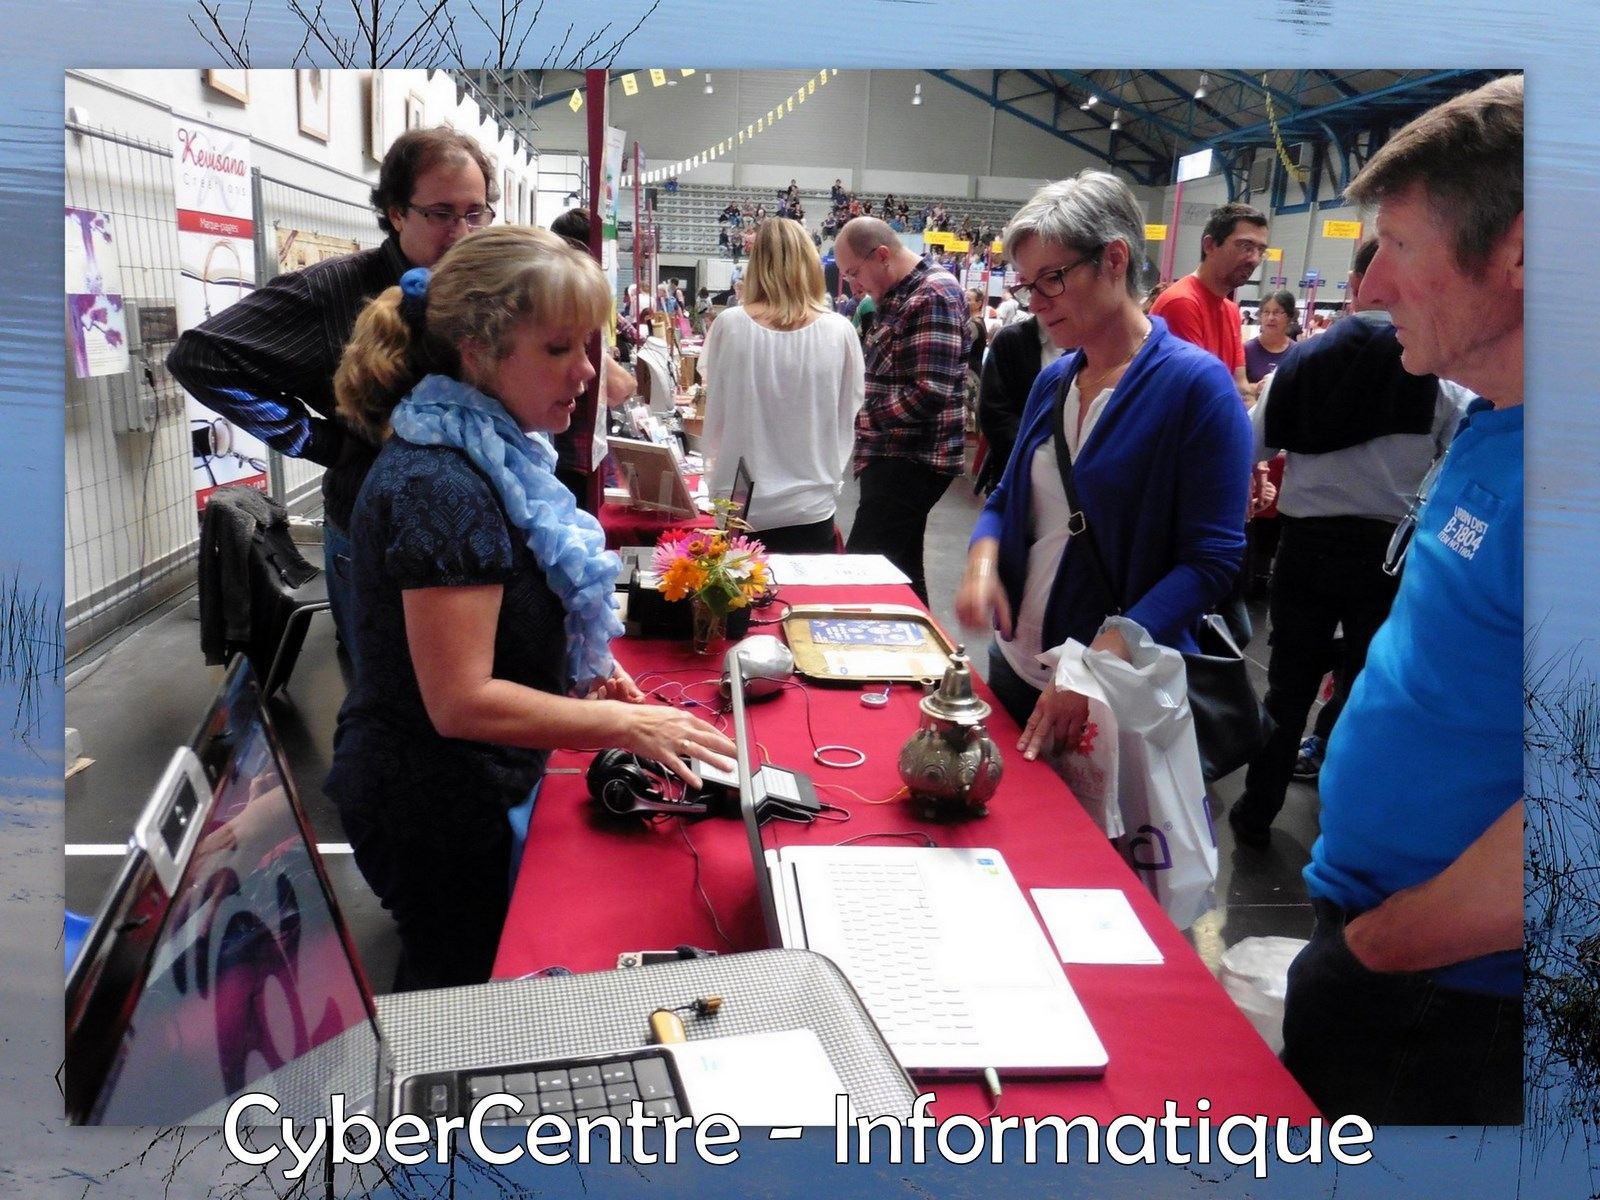 CyberCentre